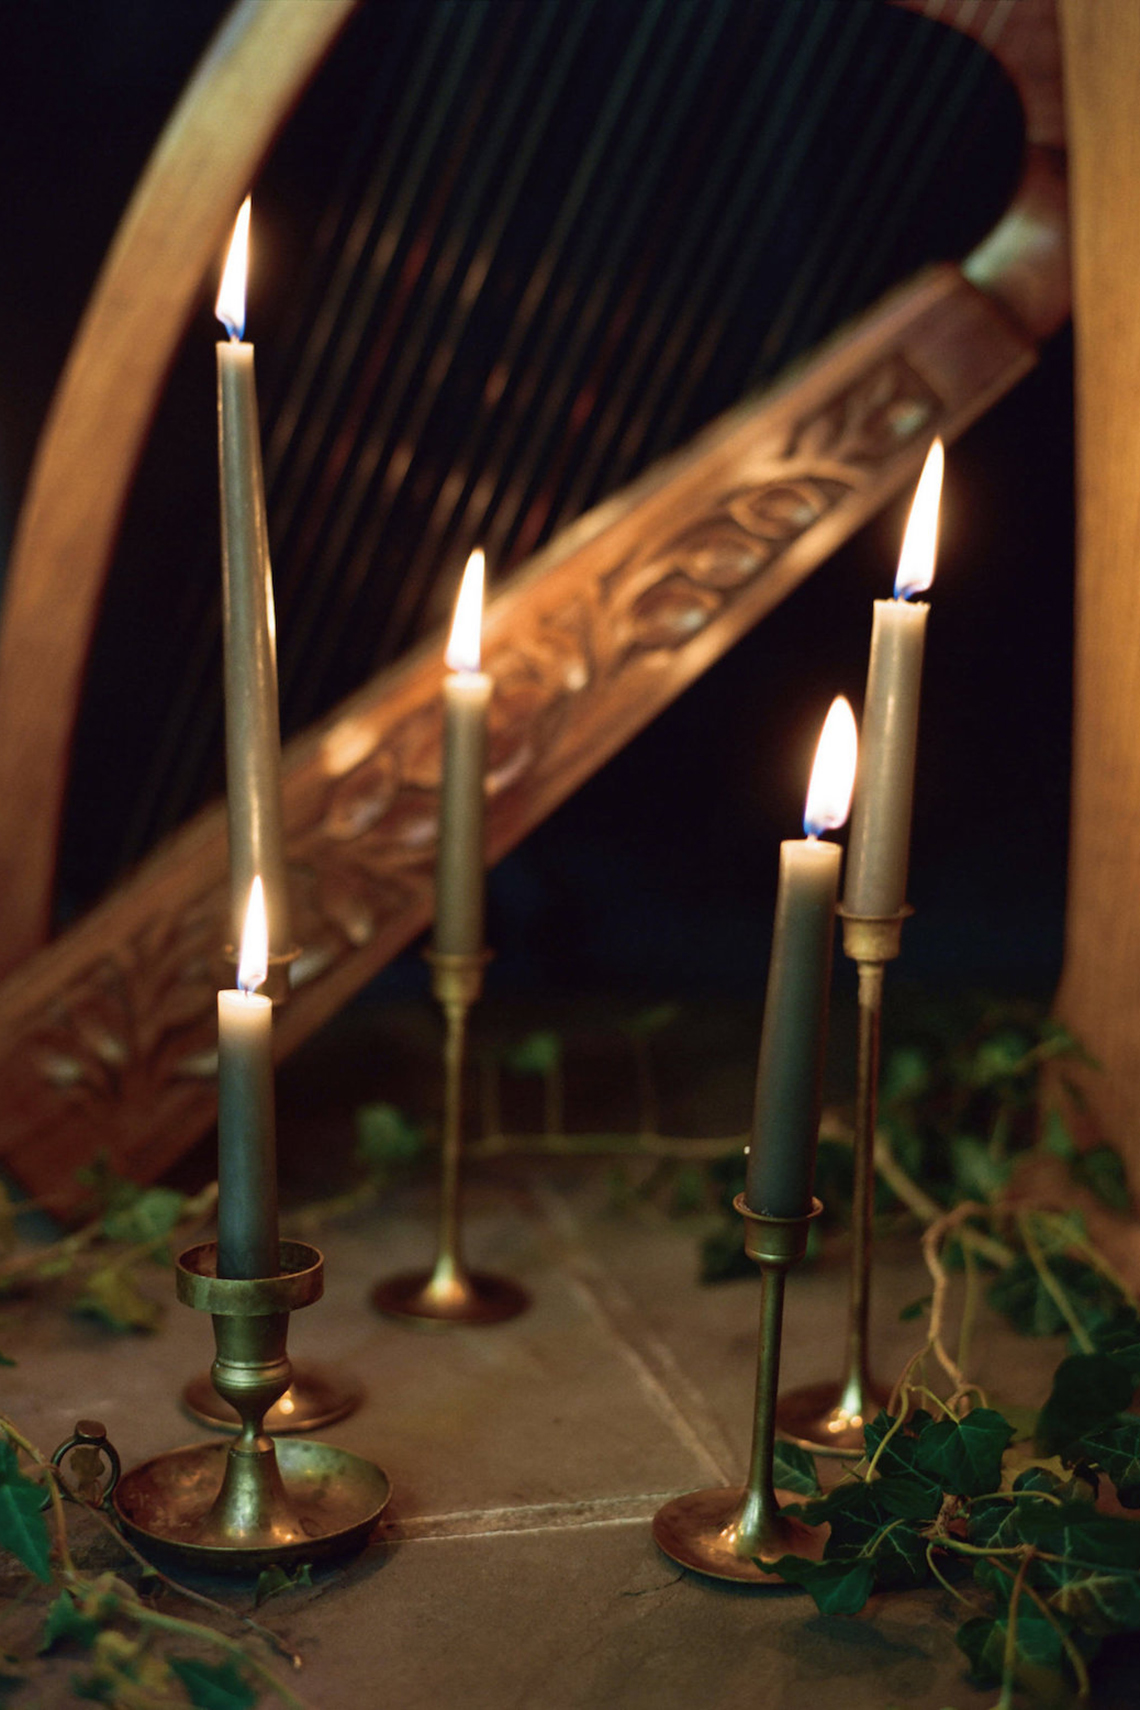 Romantic Candlelit Wedding Inspiration Full of Drama | Megan Wynn 26